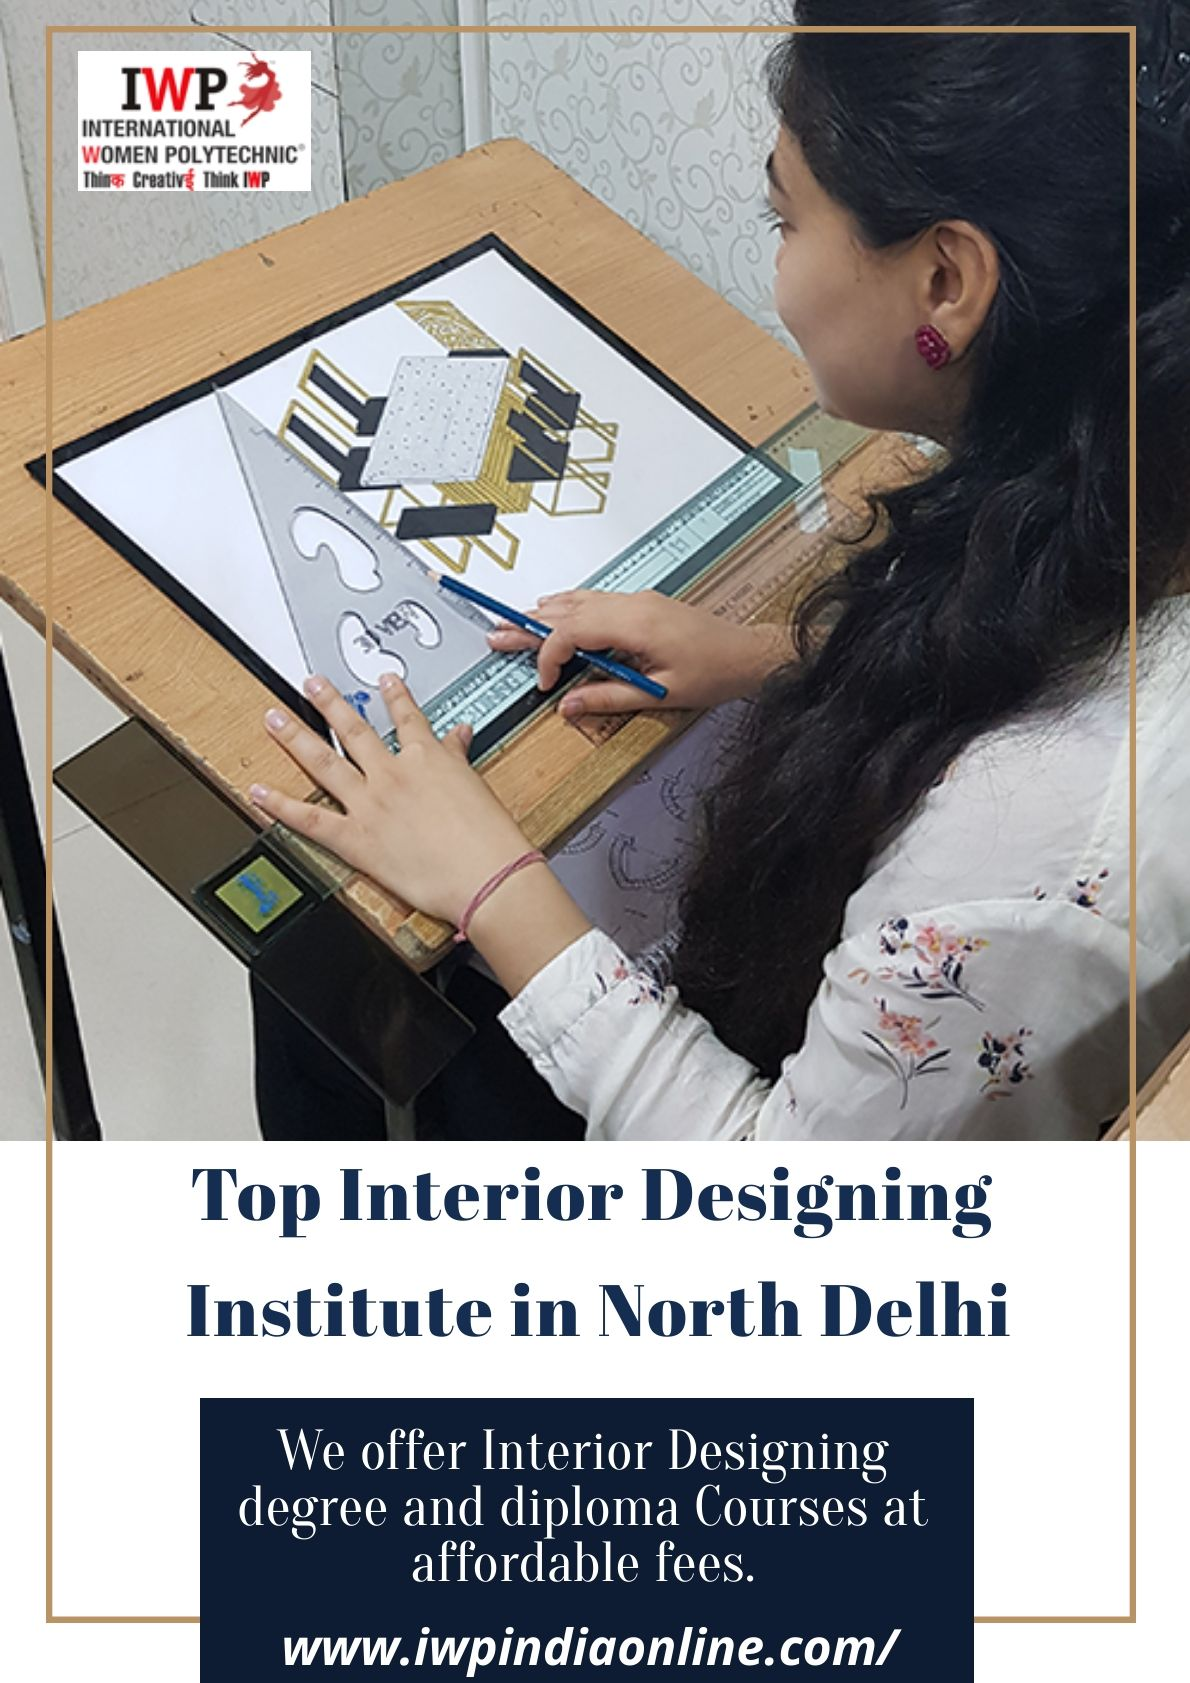 International Women Polytechnic Iwp Is One Of The Top Interior Designing Institute In North Delhi Offered Interior Model Town Design Interior Design Institute